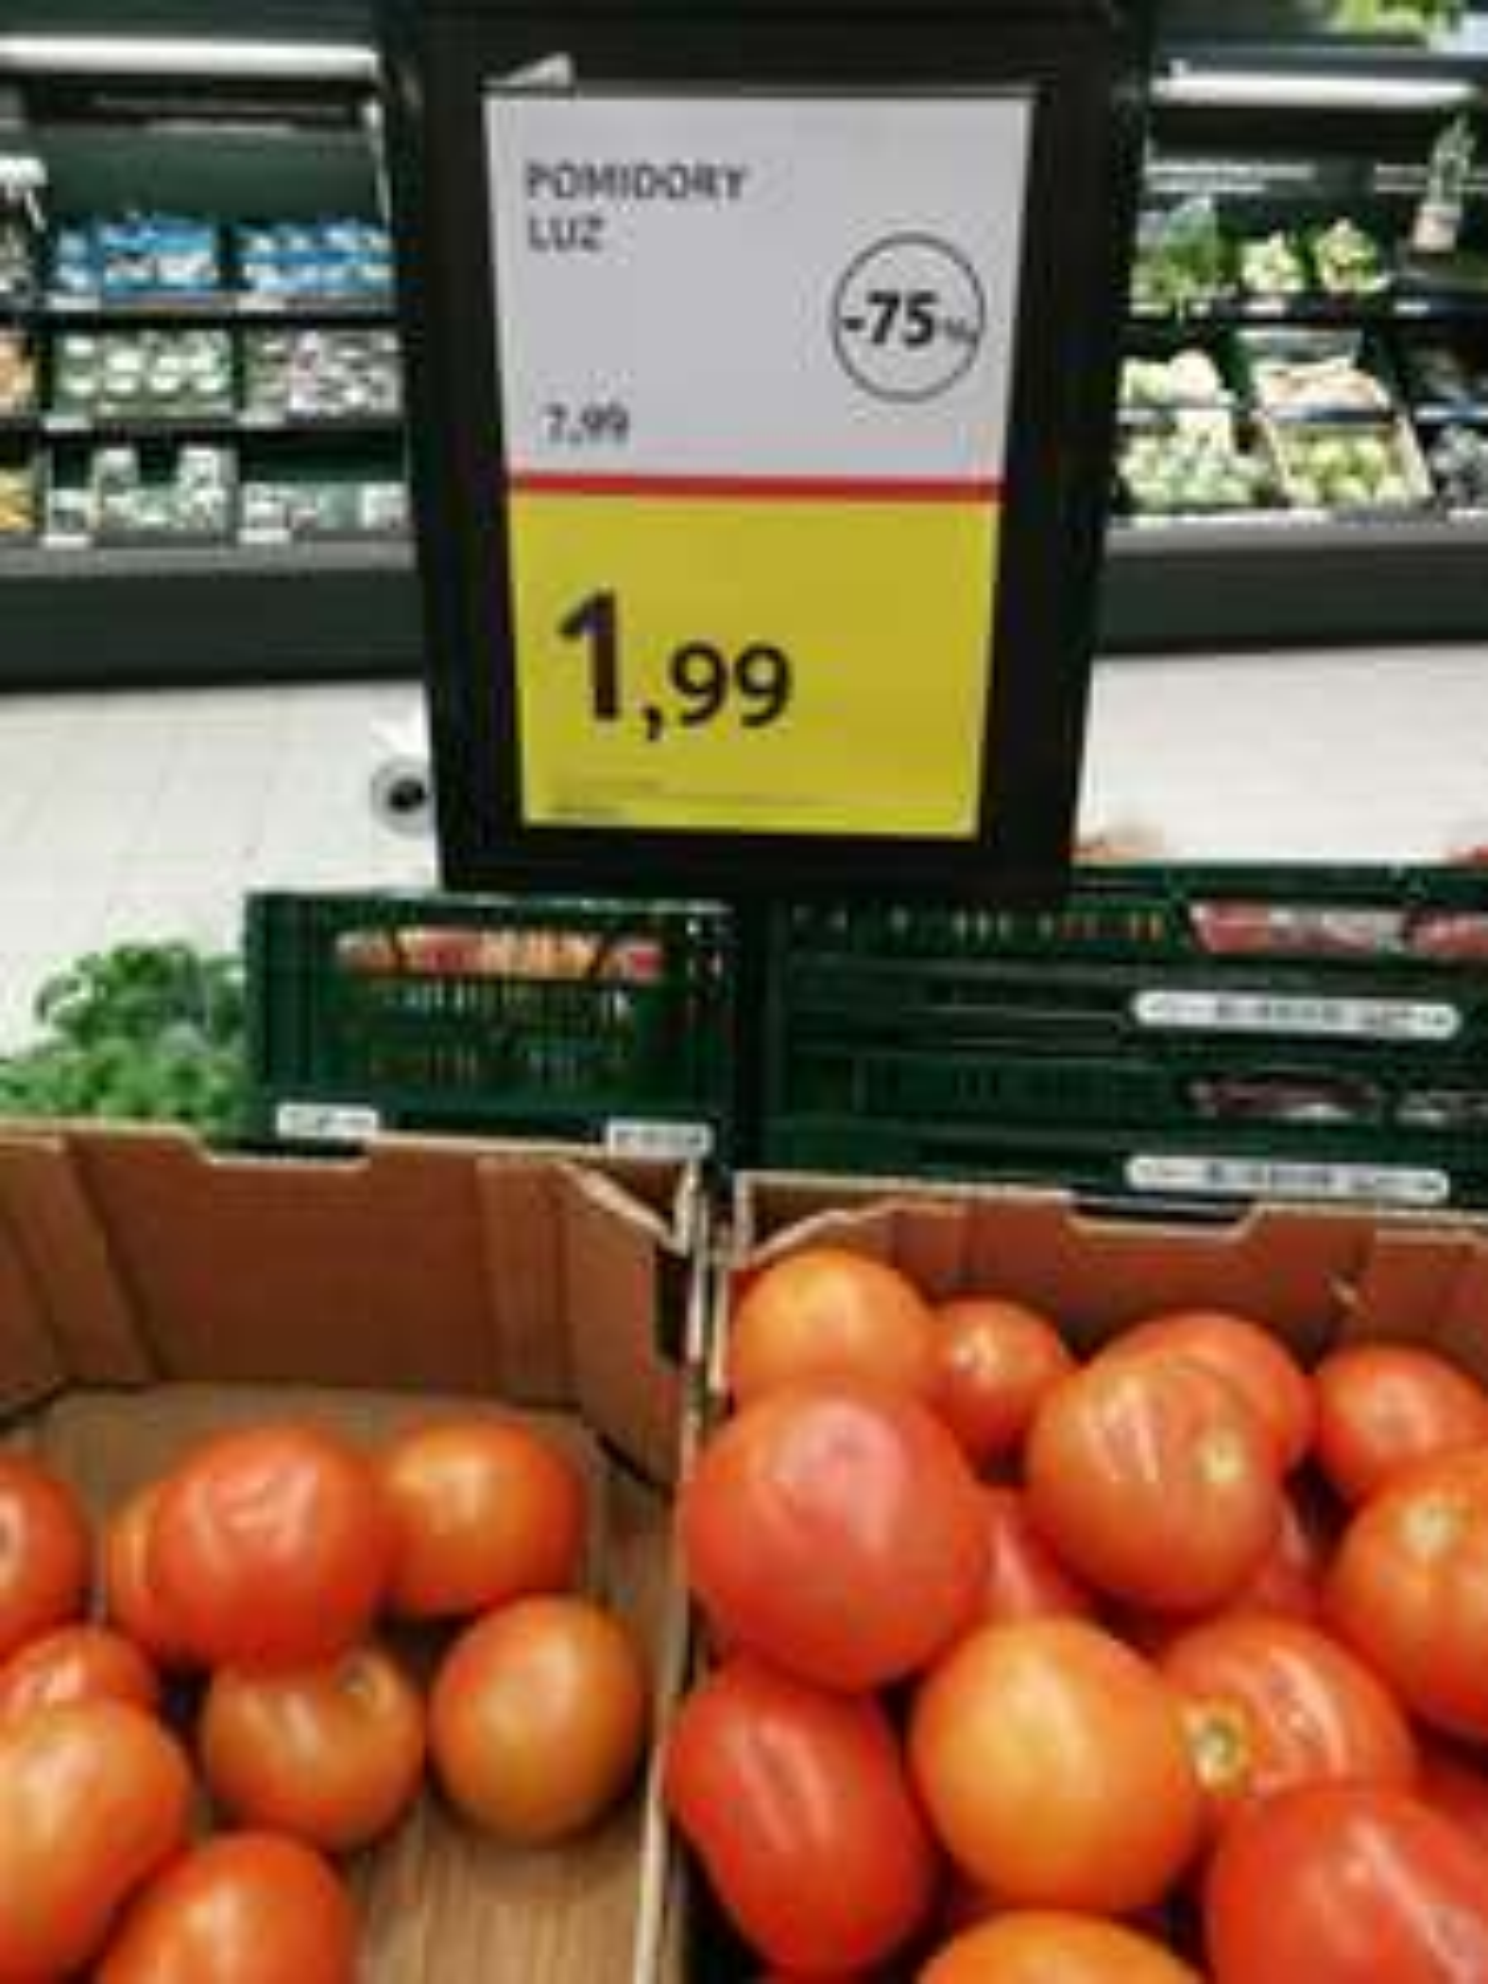 Pomidory Tesco za 1,99 /kg